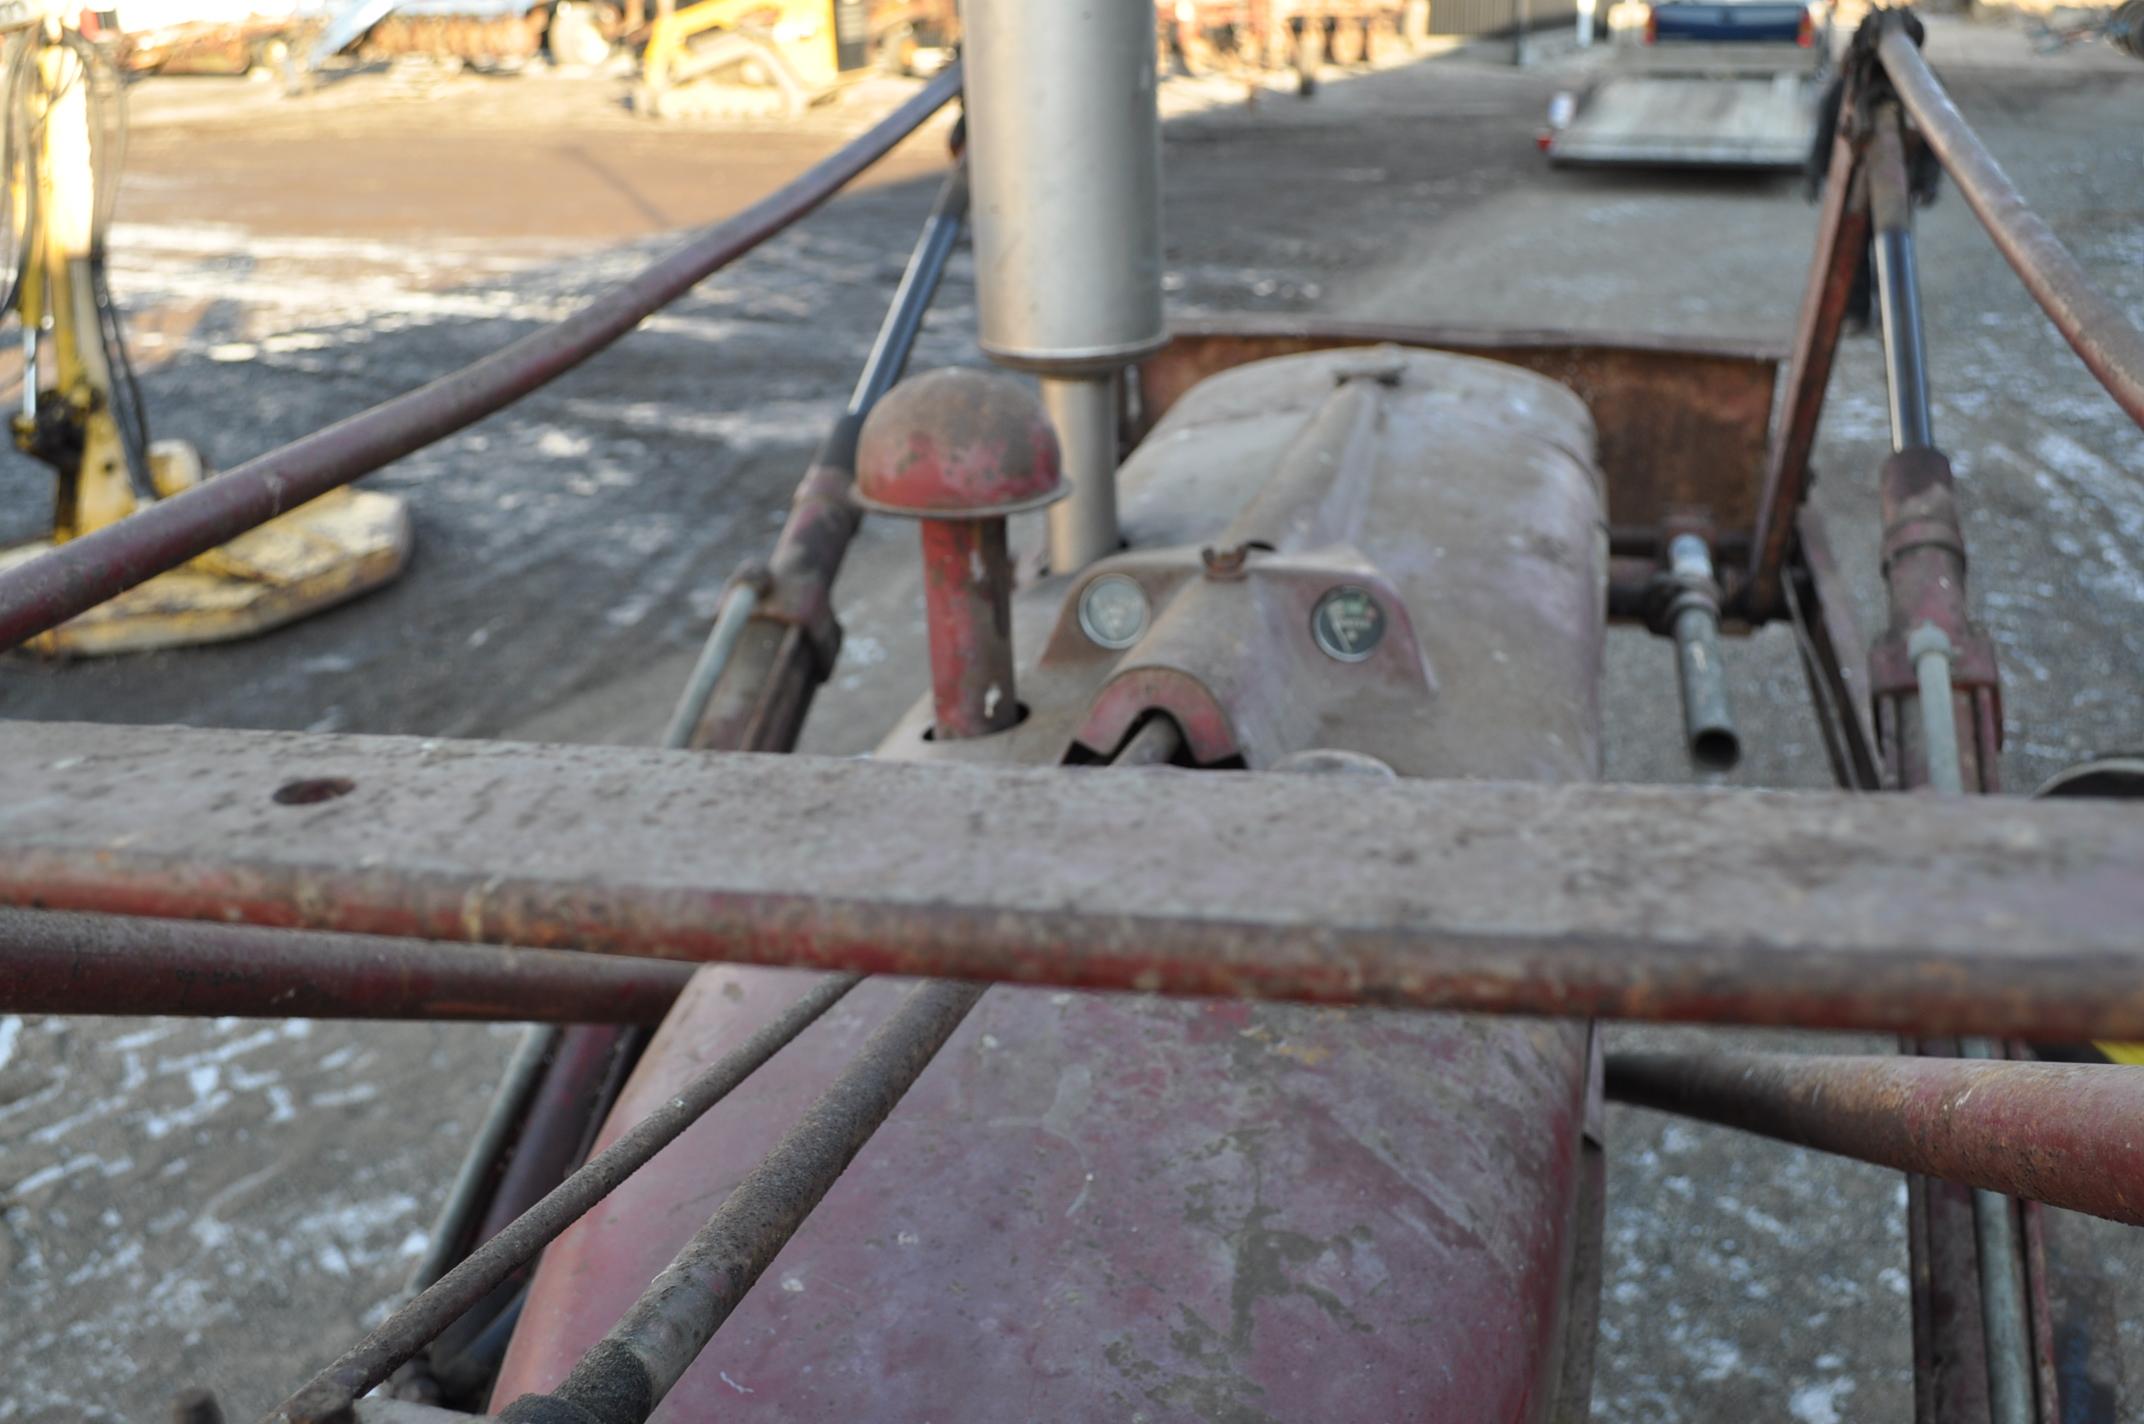 Farmall M tractor, 13.6-38 rear, narrow front, gasoline, loader, 540 PTO, SN FBK276 - Image 11 of 11